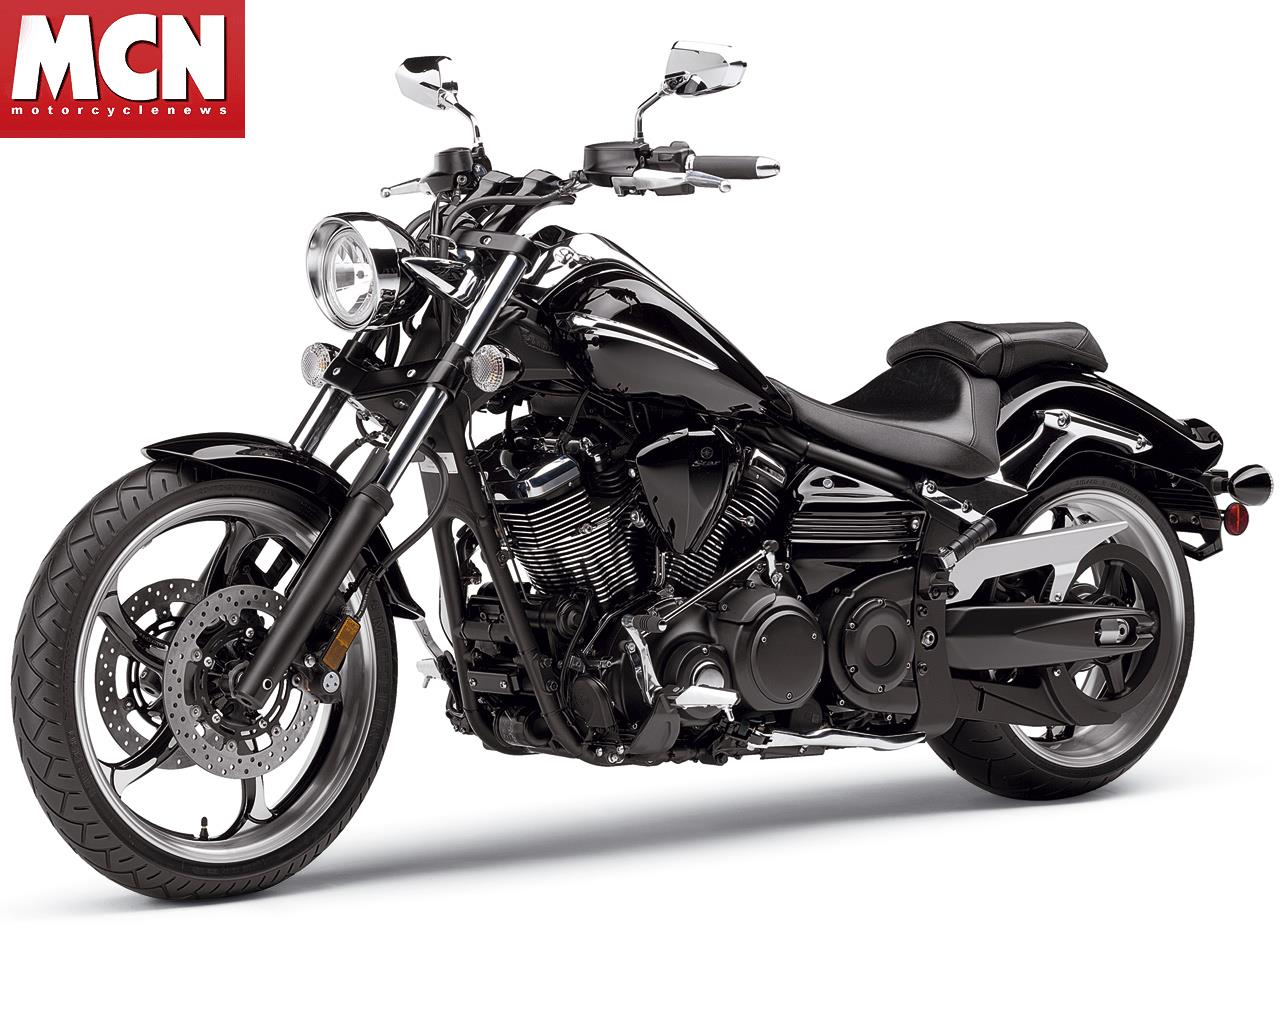 yamaha raider cruiser motorcycle 2008 custom xv1900 motorcycles mcn 2007 motorbikes bikes bmw